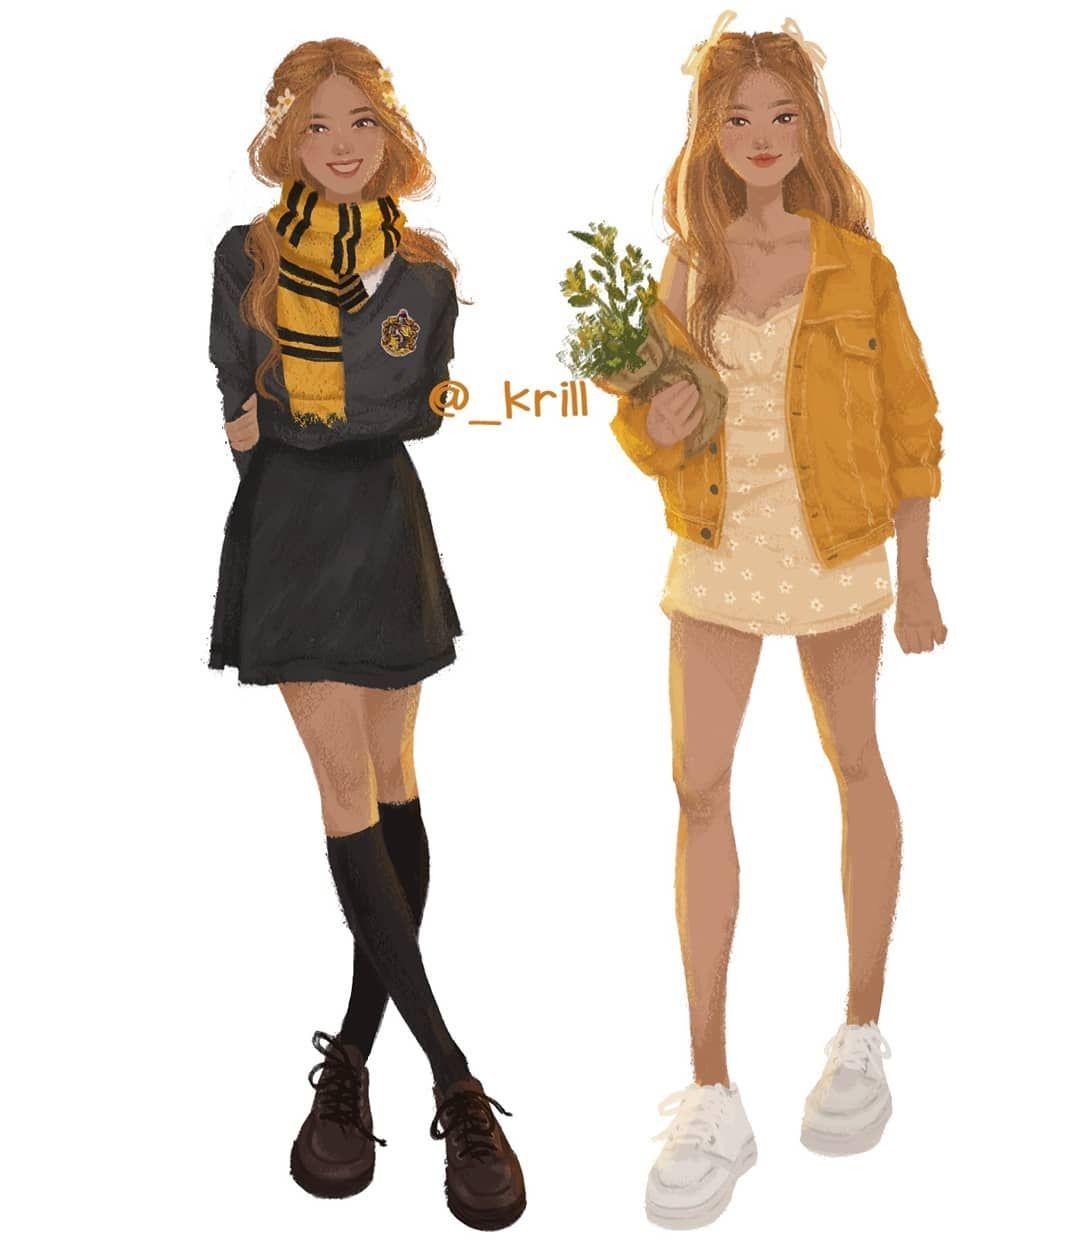 Krill On Instagram Blackpink As Their Hogwarts Houses Rose Year 6 Hufflepuff Favor Harry Potter Outfits Harry Potter Anime Harry Potter Aesthetic